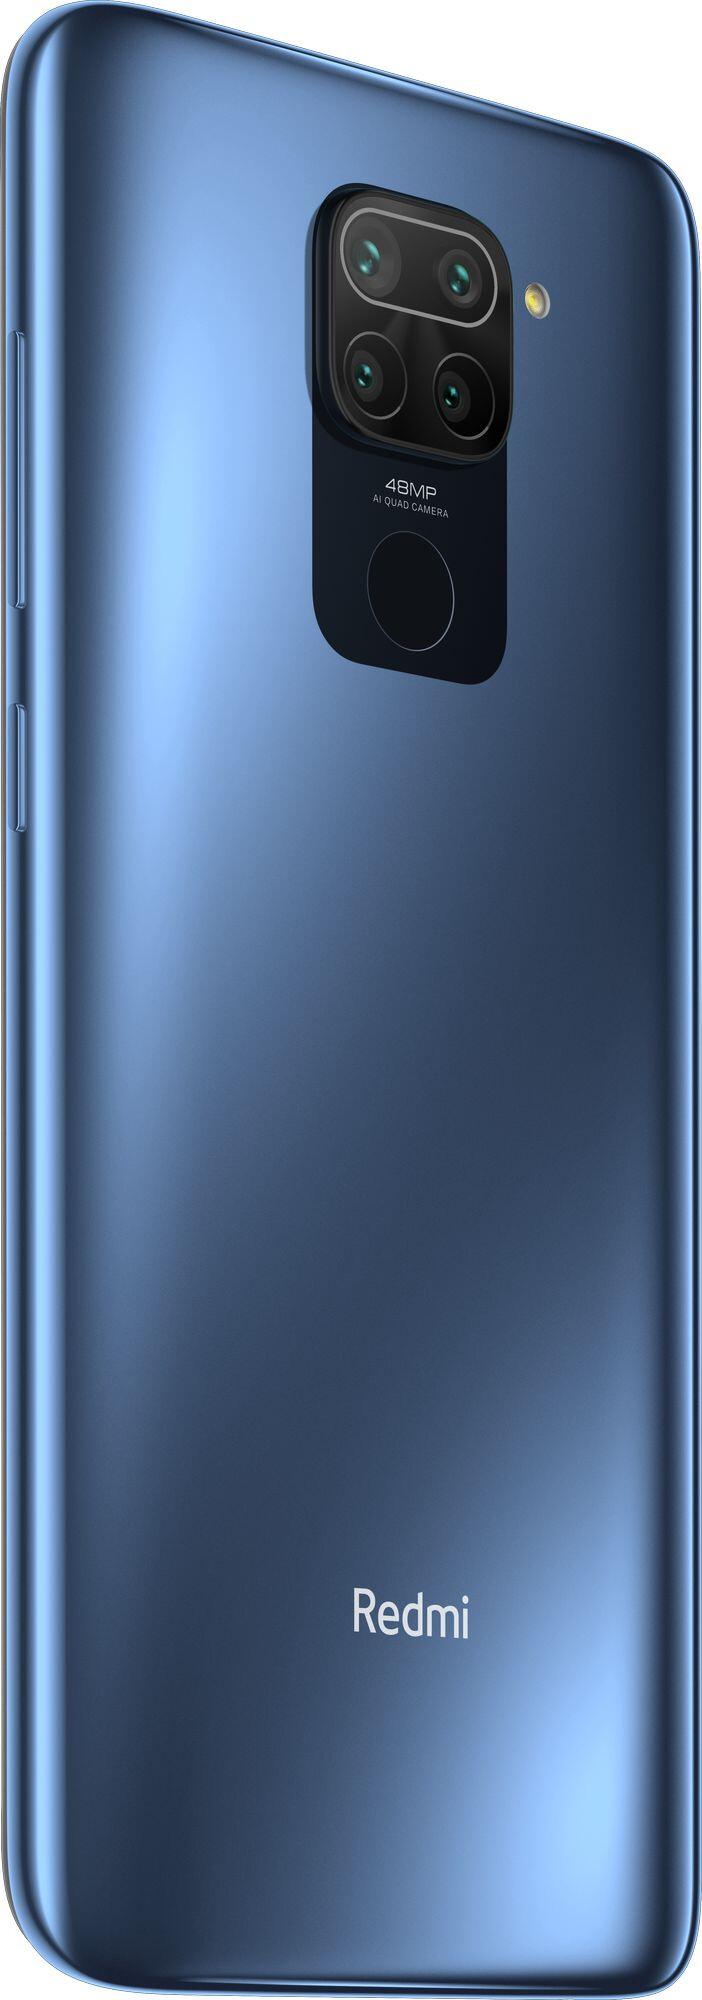 Xiaomi Redmi Note 9 4GB/128GB grey - 4